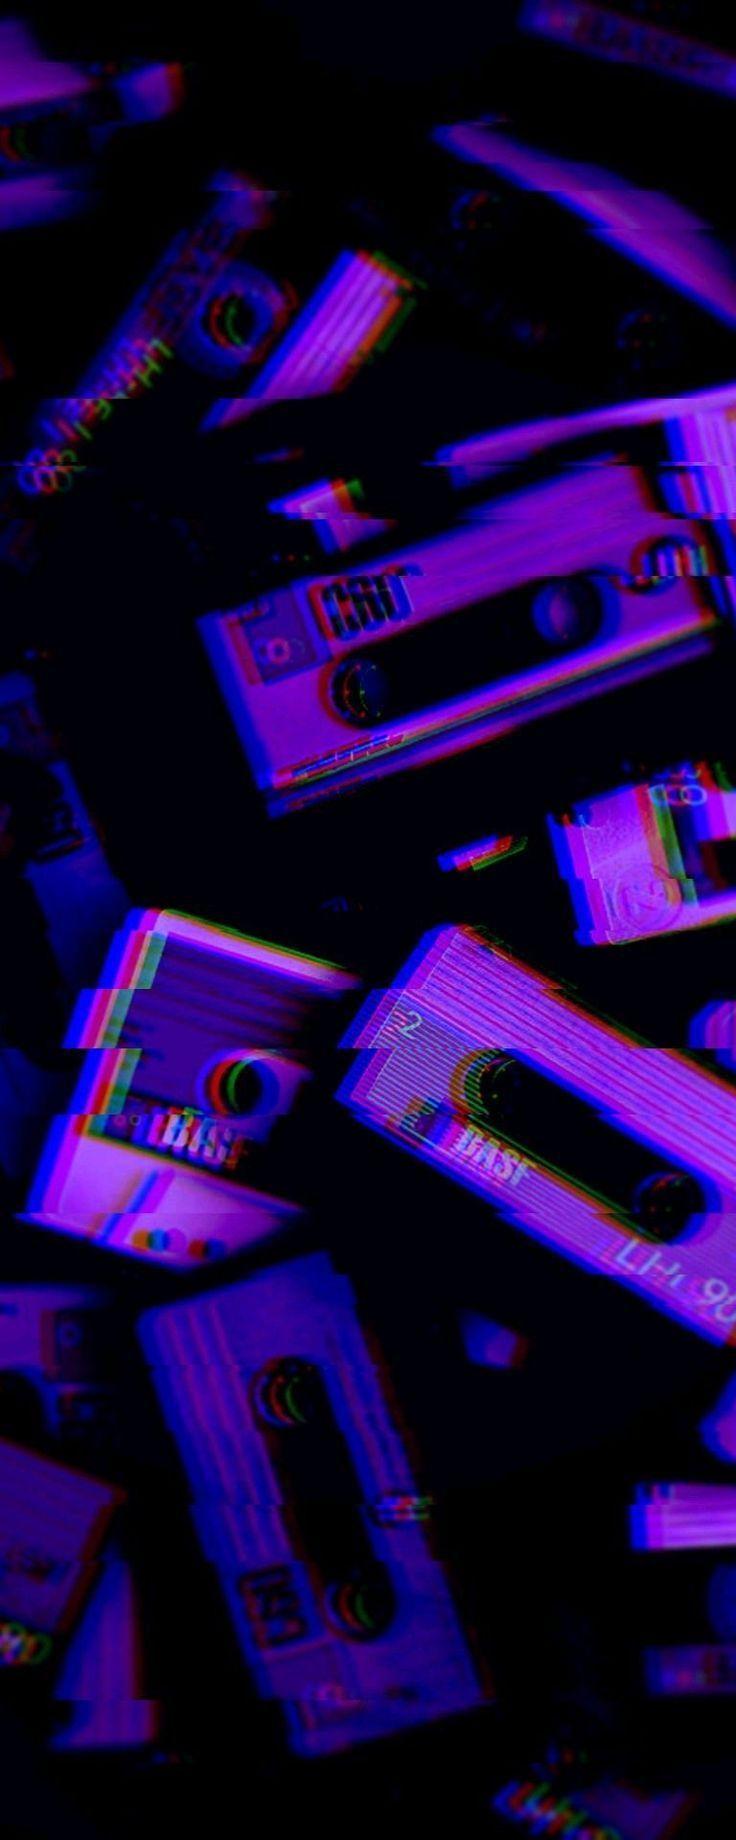 Lock Screen Wallpapers Rapper Band Trap Festival Musicvideo Video Band Festival Lock Screen Wallpaper Iphone Locked Wallpaper Lock Screen Wallpaper